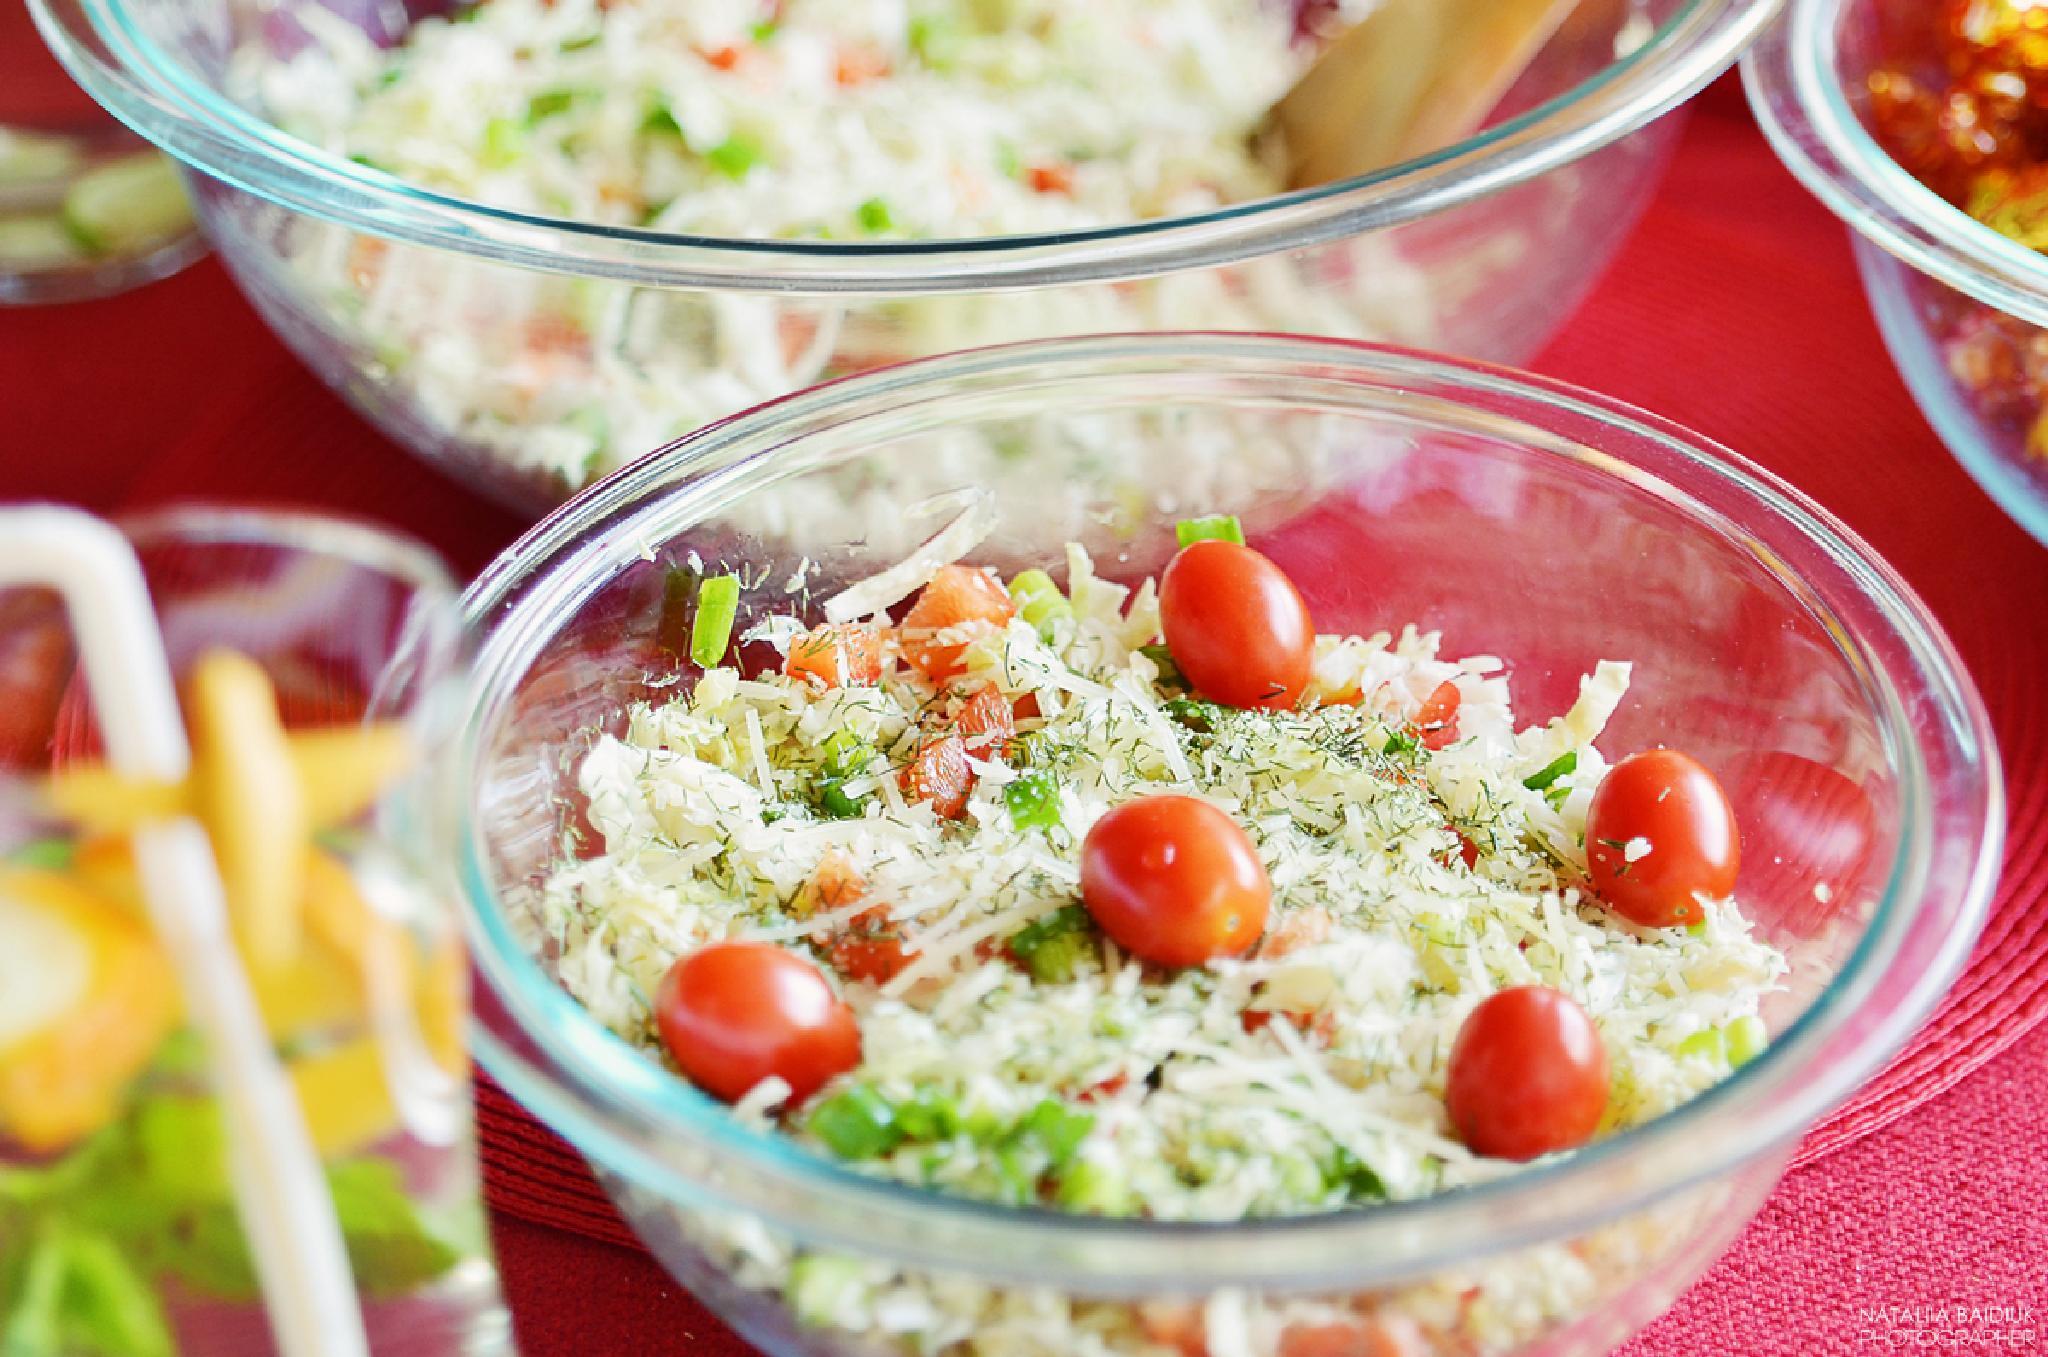 Healthy lunch by Nataliia Baidiuk